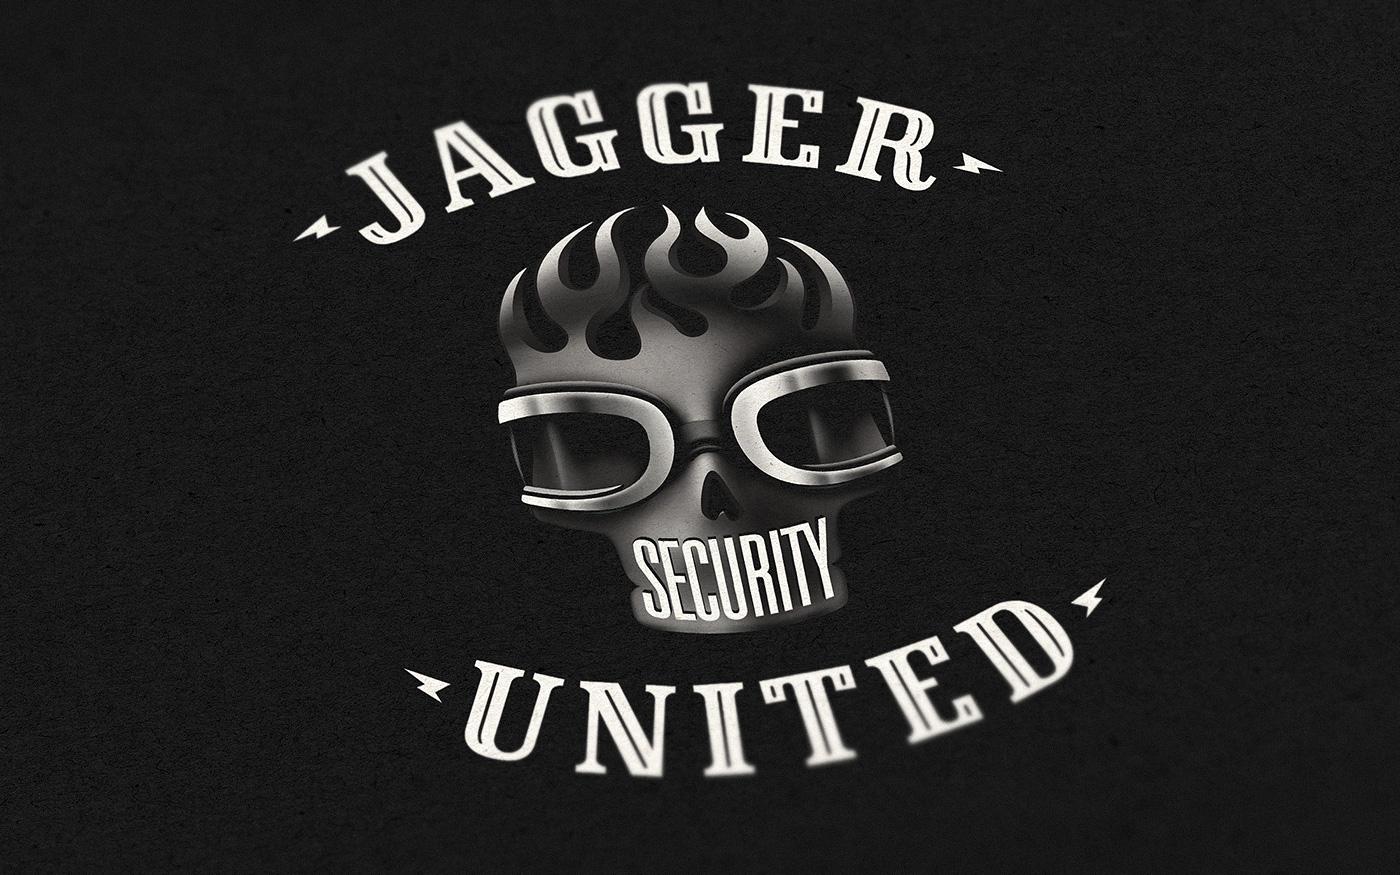 g_big_jagger_12